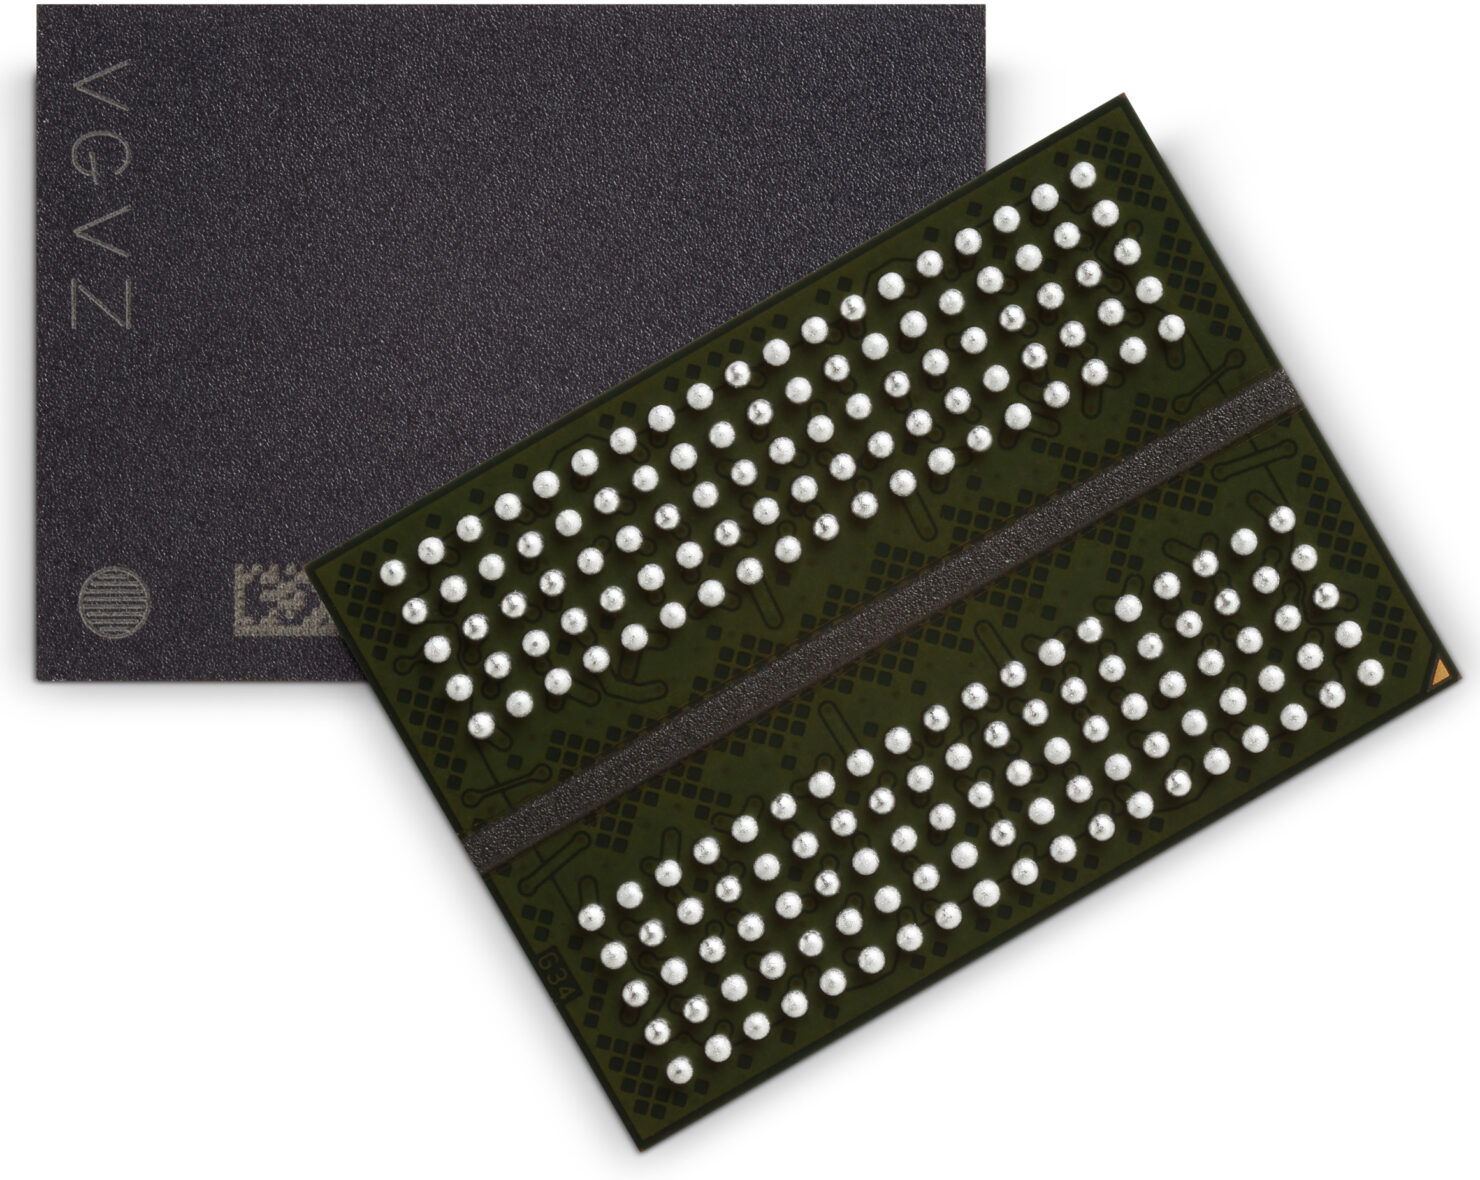 micron-gddr5x-sample_1